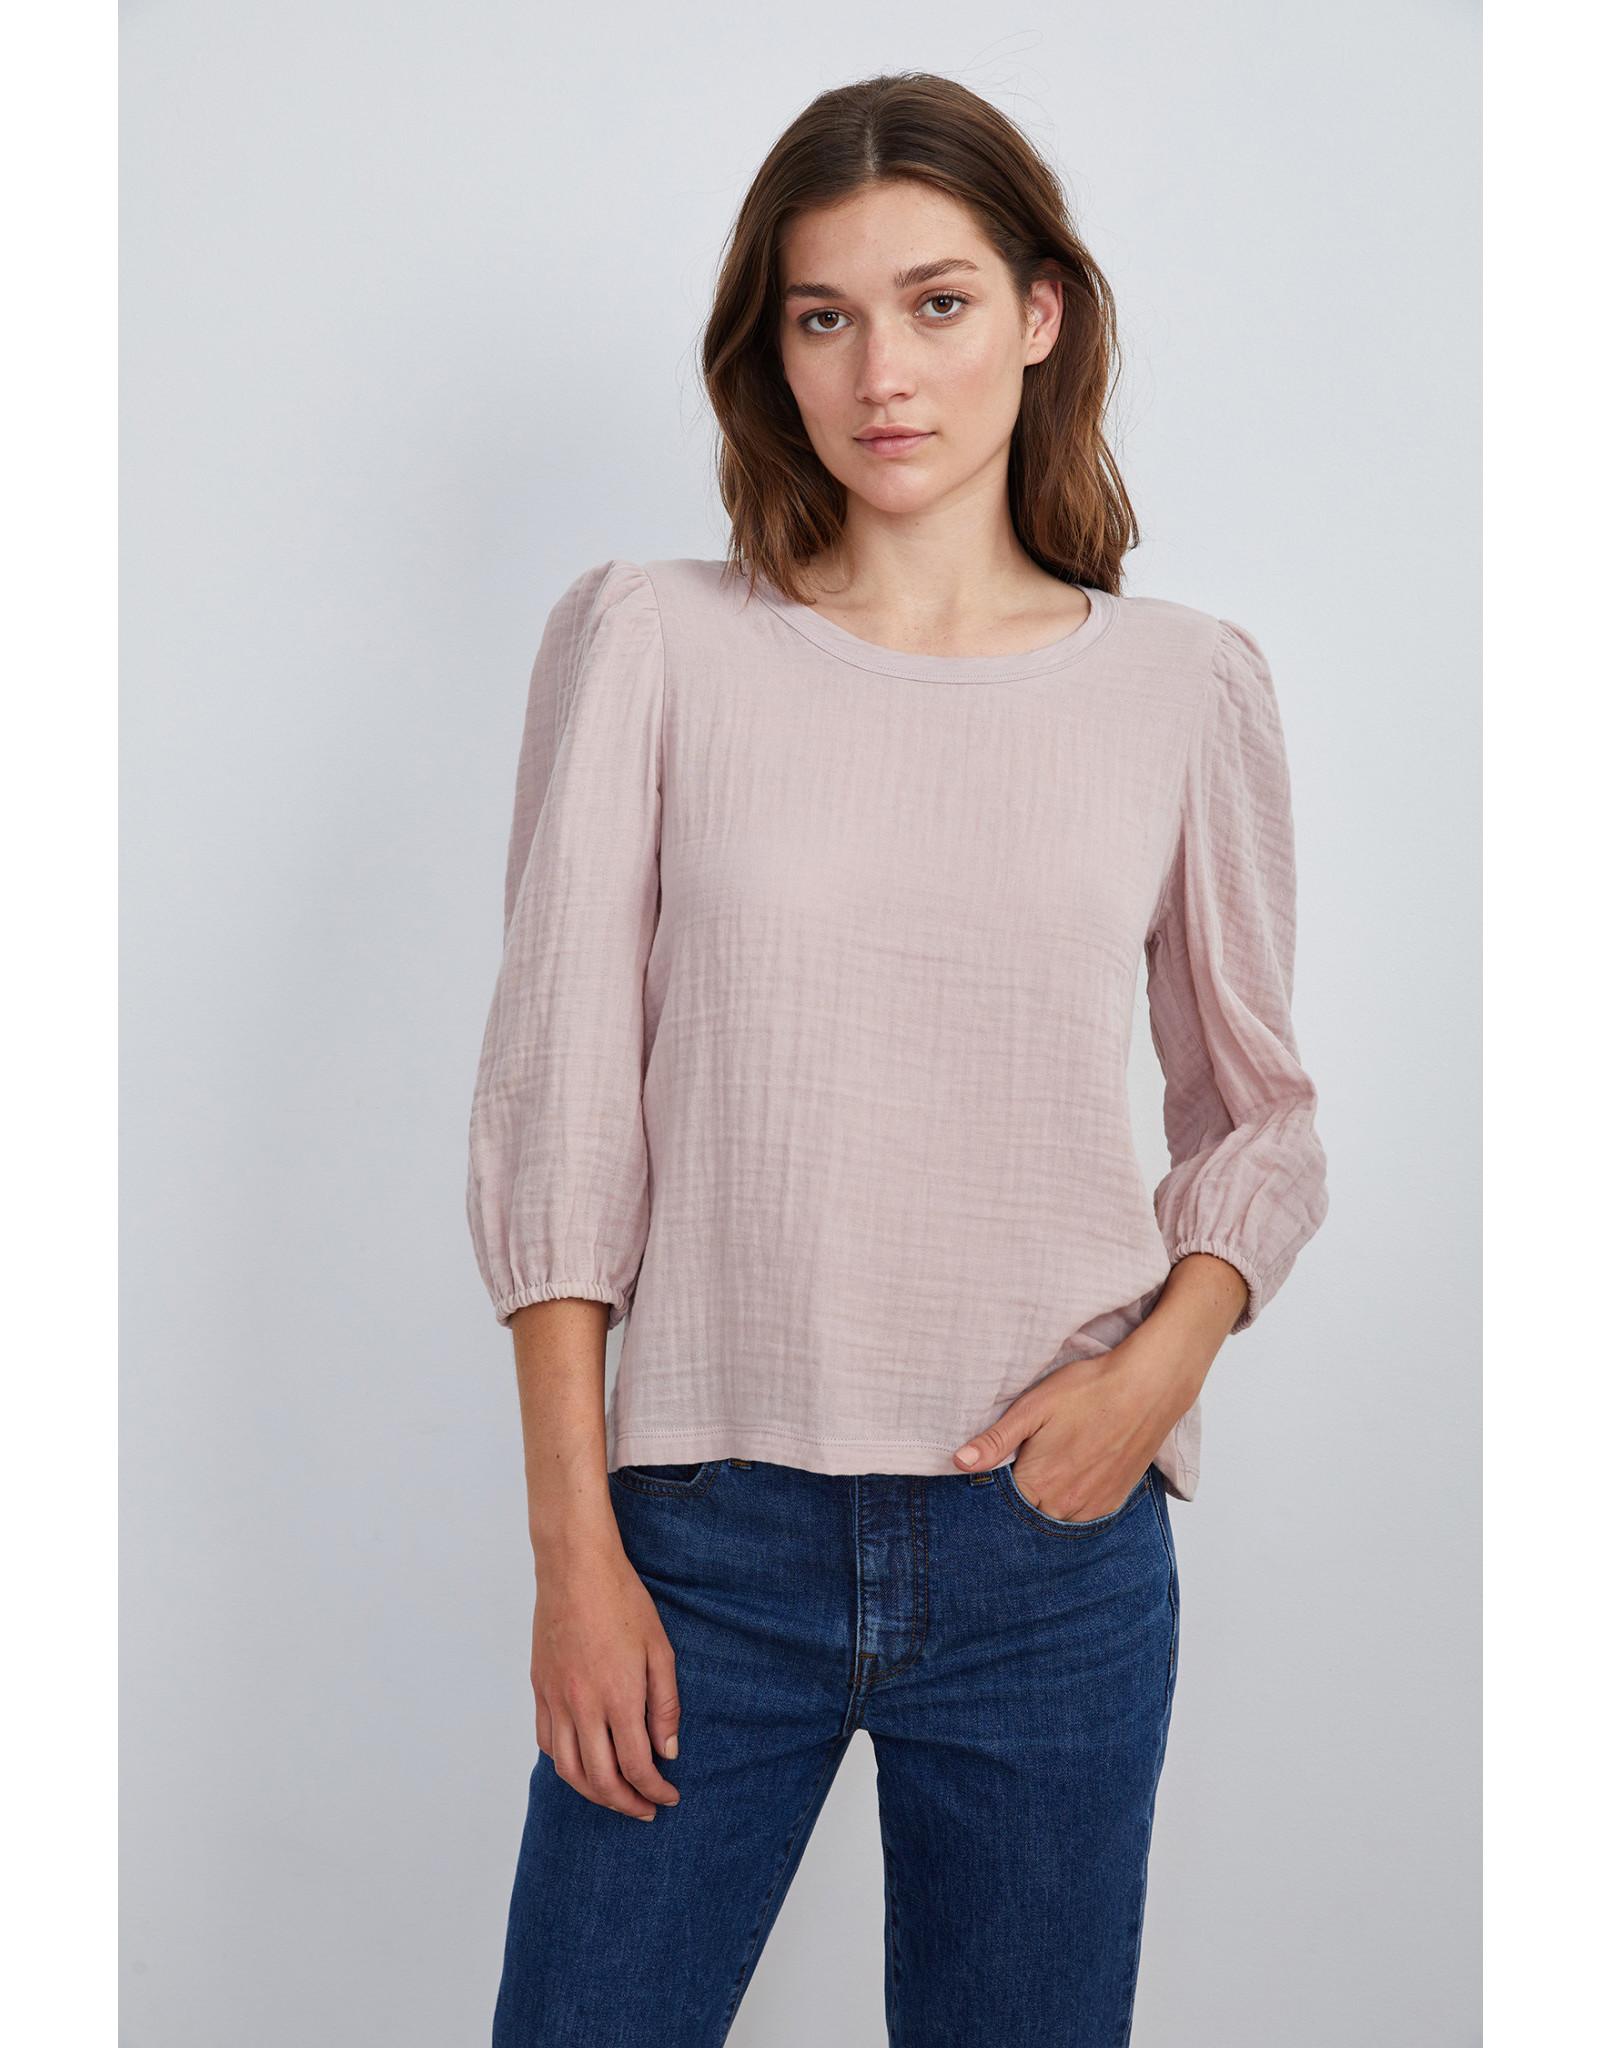 Velvet Velvet Reeba Cotton Slub Peasant Top